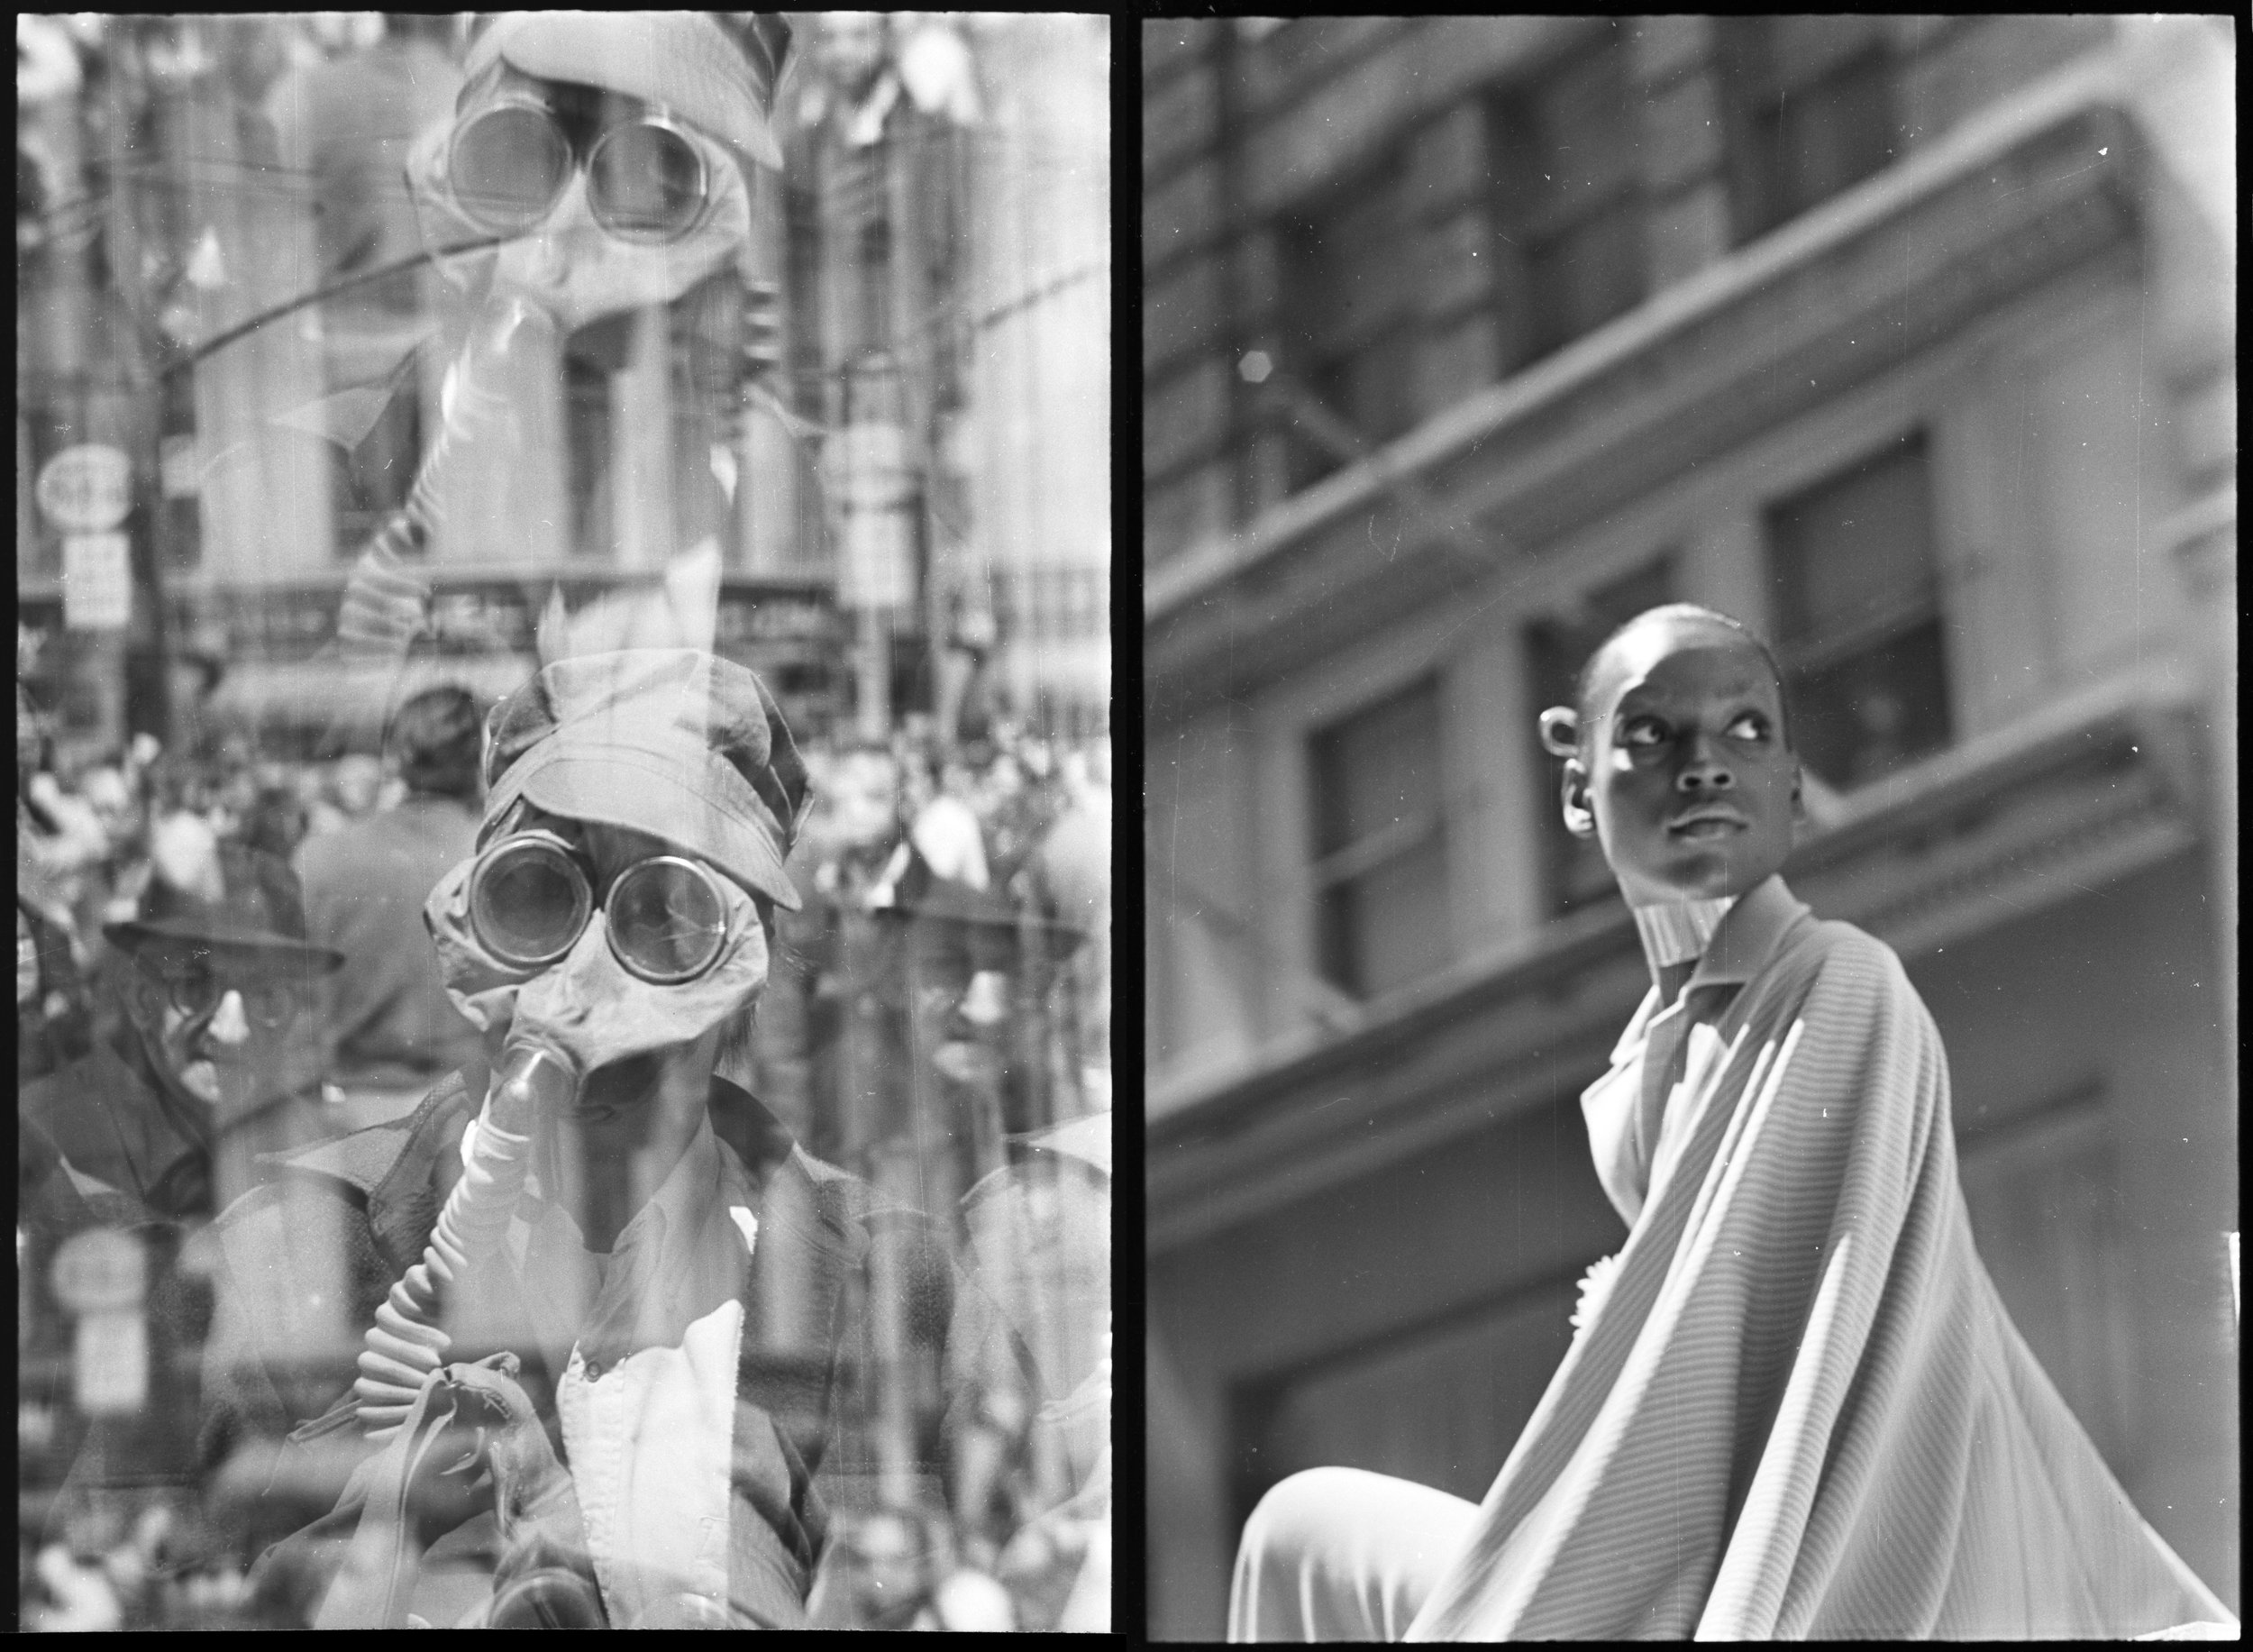 Earth Day Parade, April 22, 1970